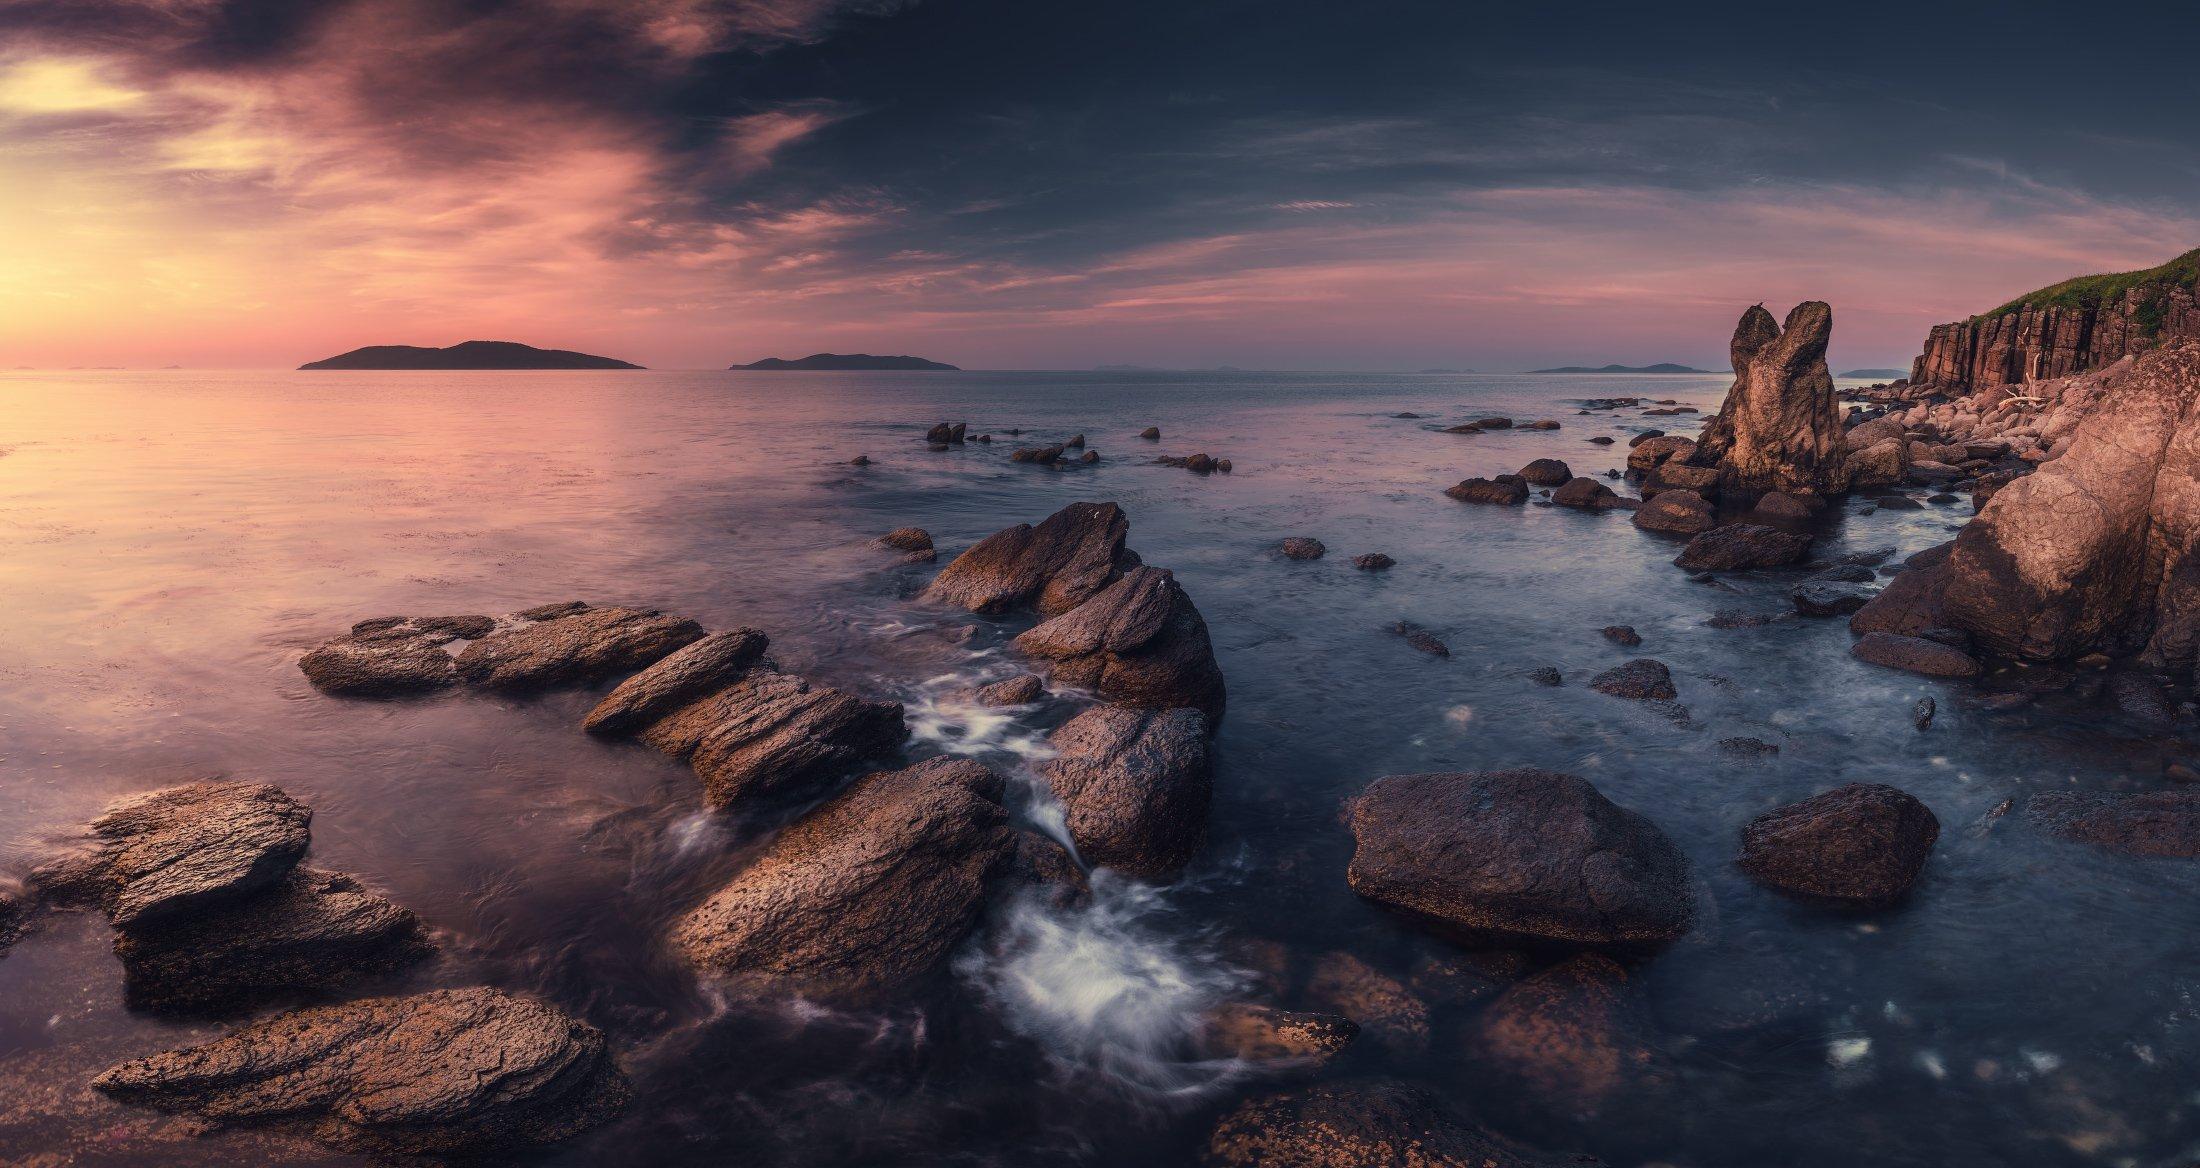 панорама, море, скалы, камни, утро, Андрей Кровлин